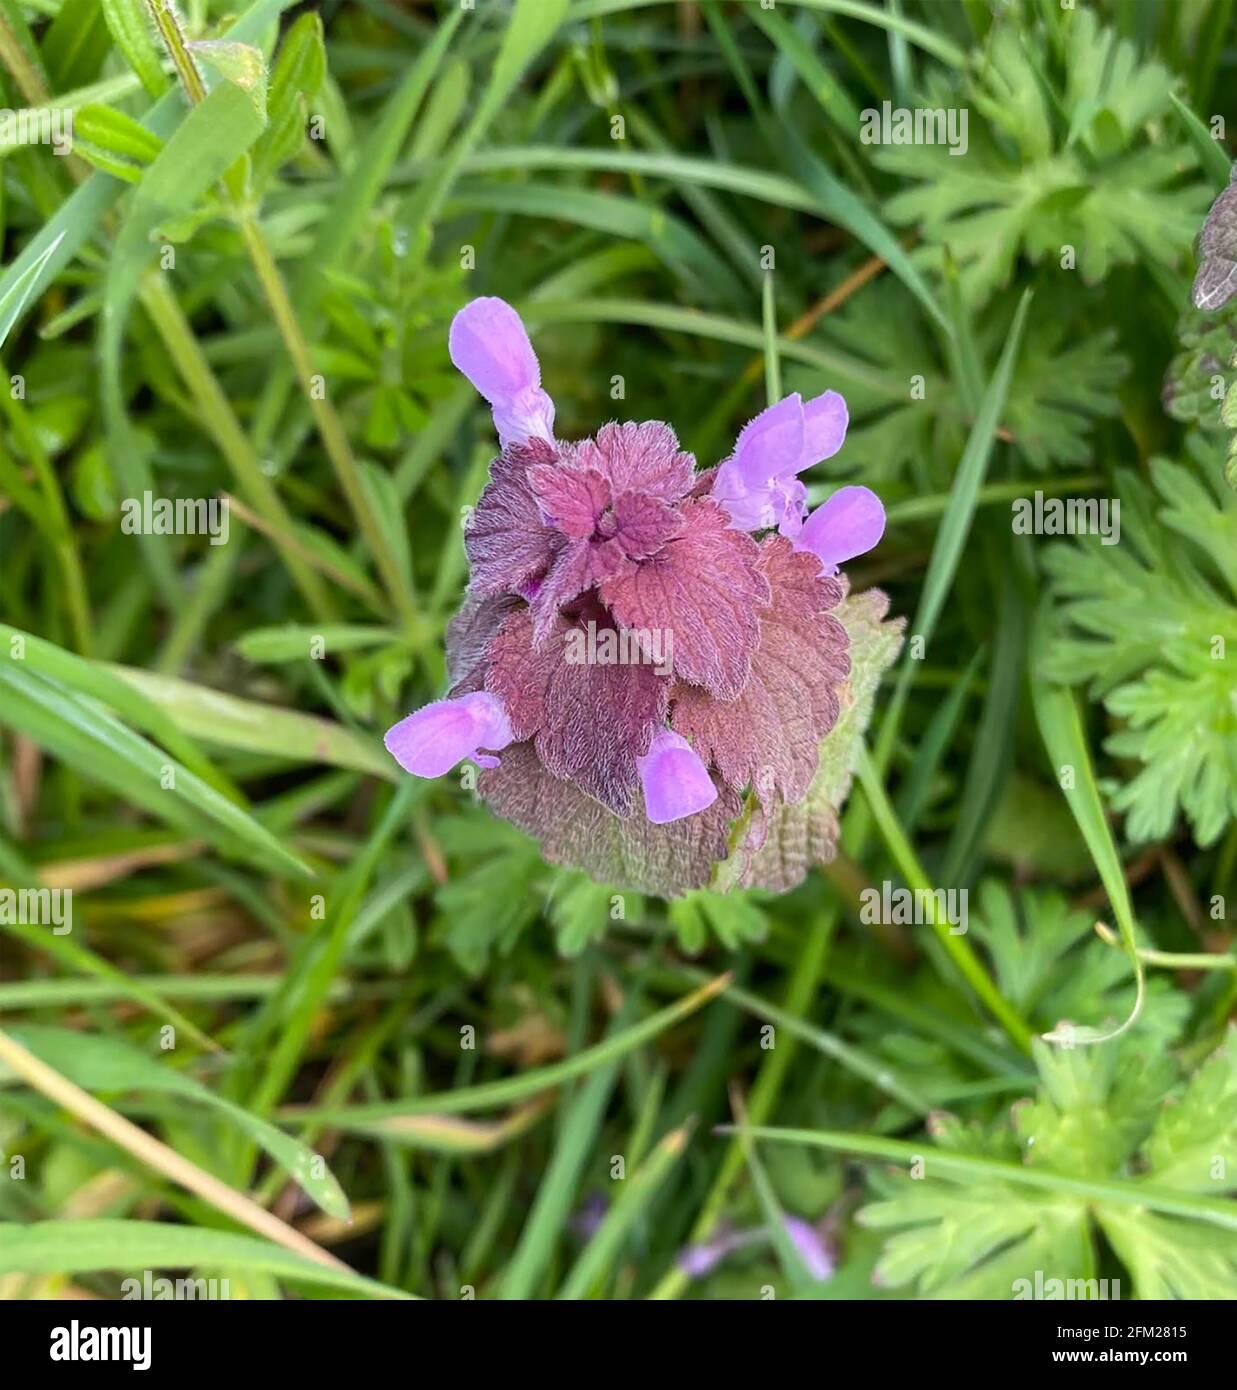 RED DEAD-NETTLE Lamium purpureum annual herbaceous plant. Photo: Tony Gale Stock Photo